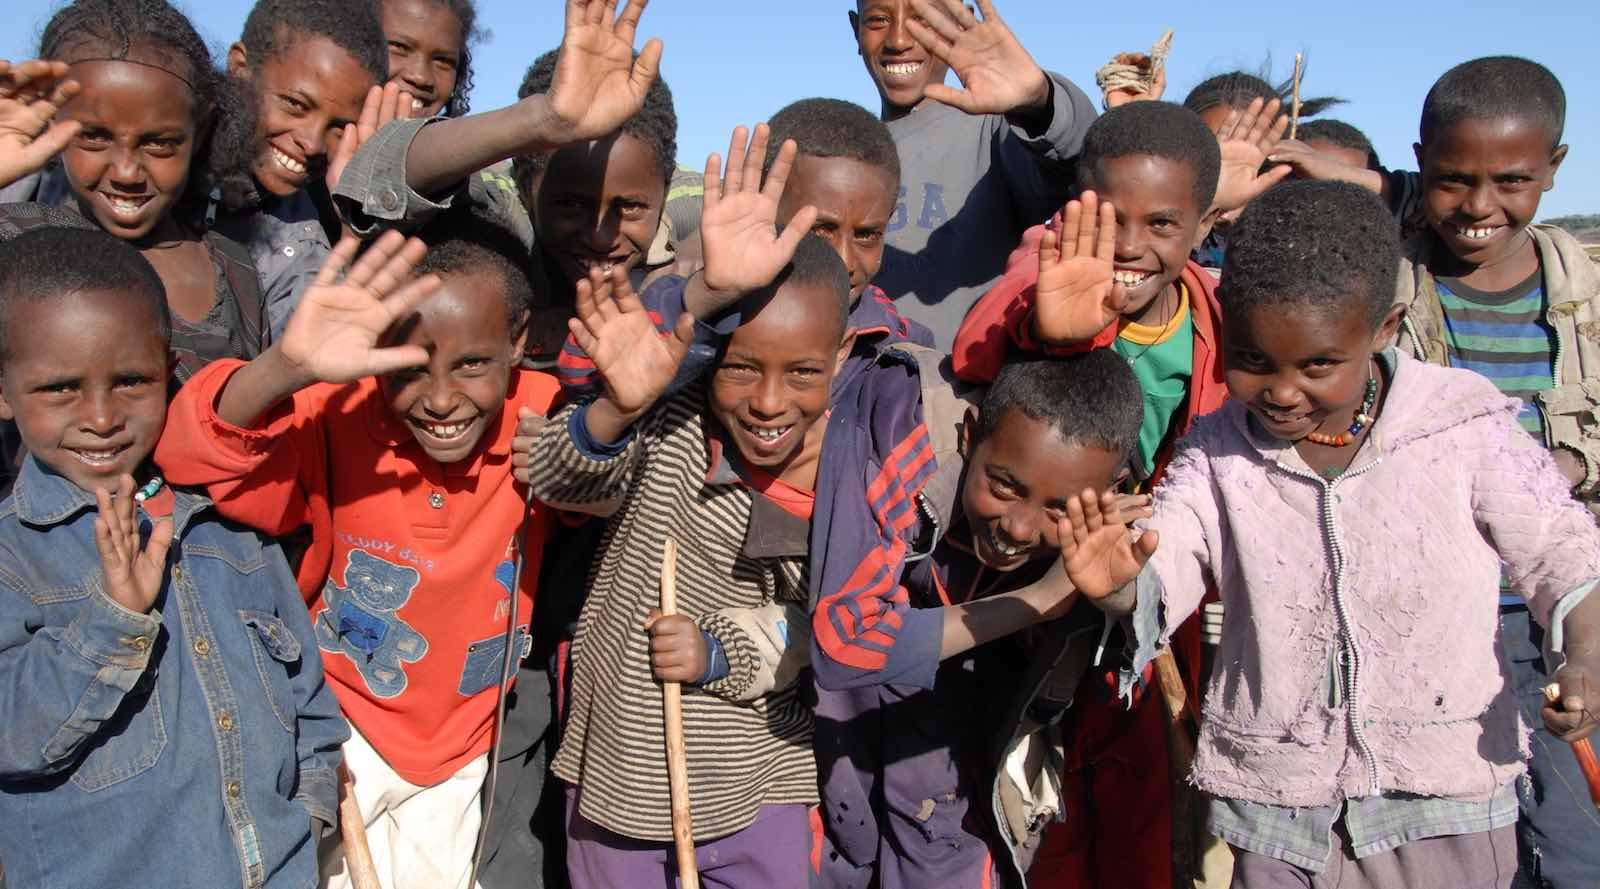 Photo: UNICEF Ethiopia/Flickr